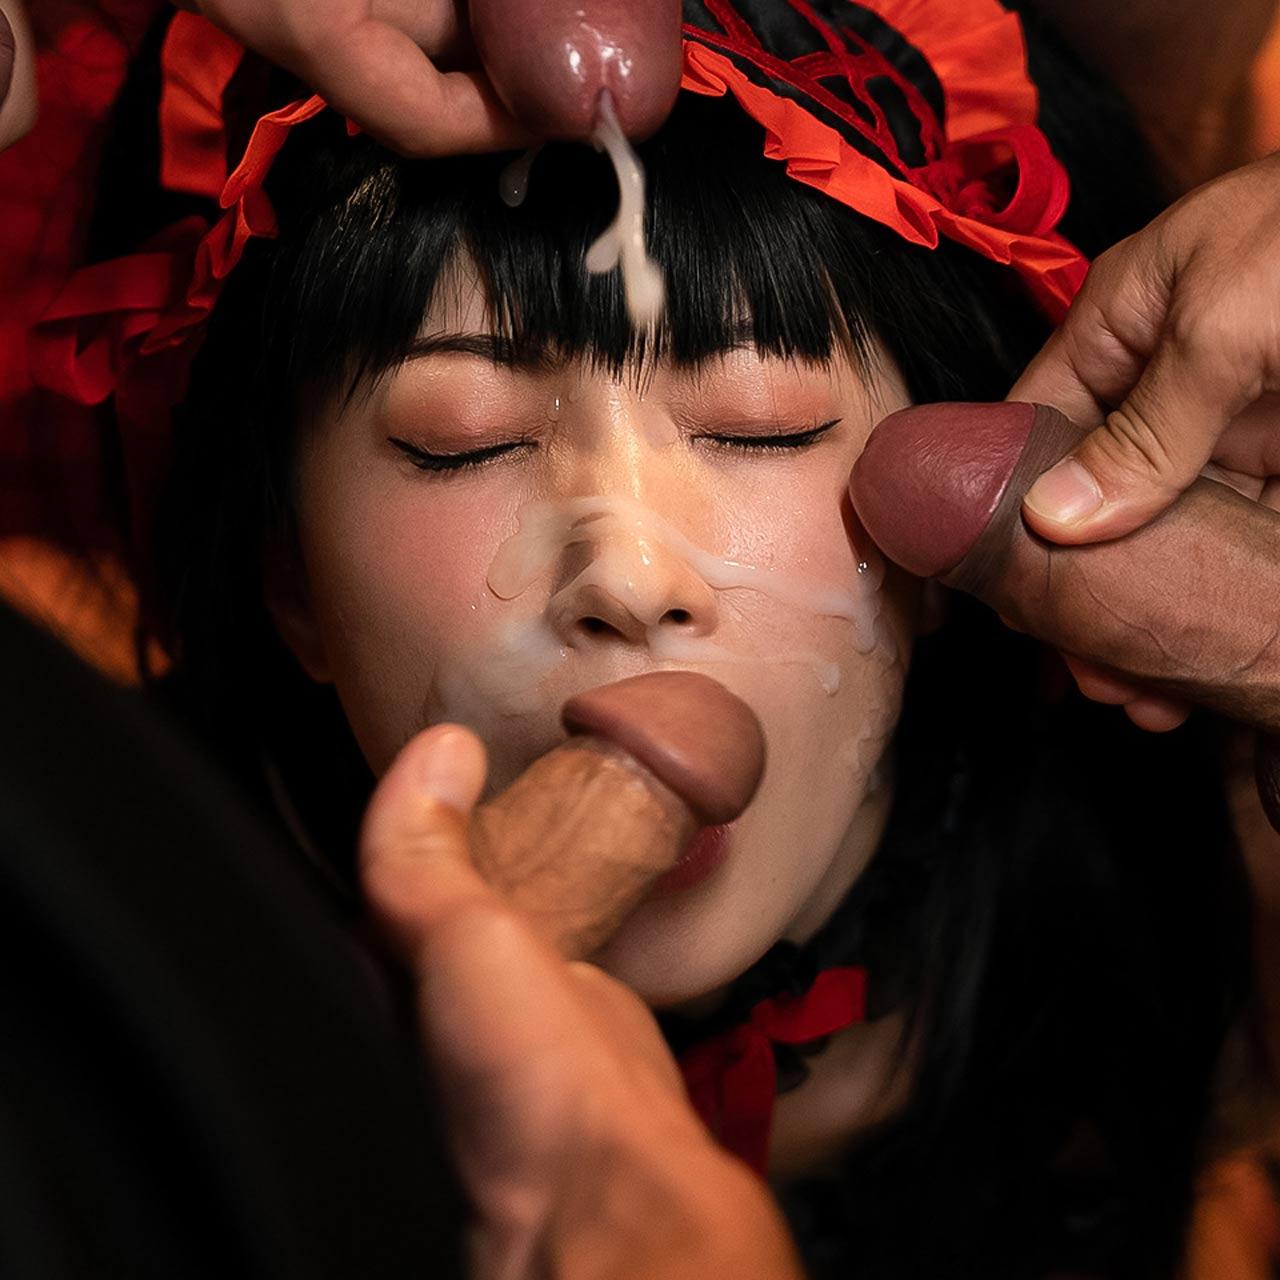 Haruka Suzuno Bukkake Cosplay at Cospuri. A Facial and Cumshot Fetish video with a Japanese AV Idol.